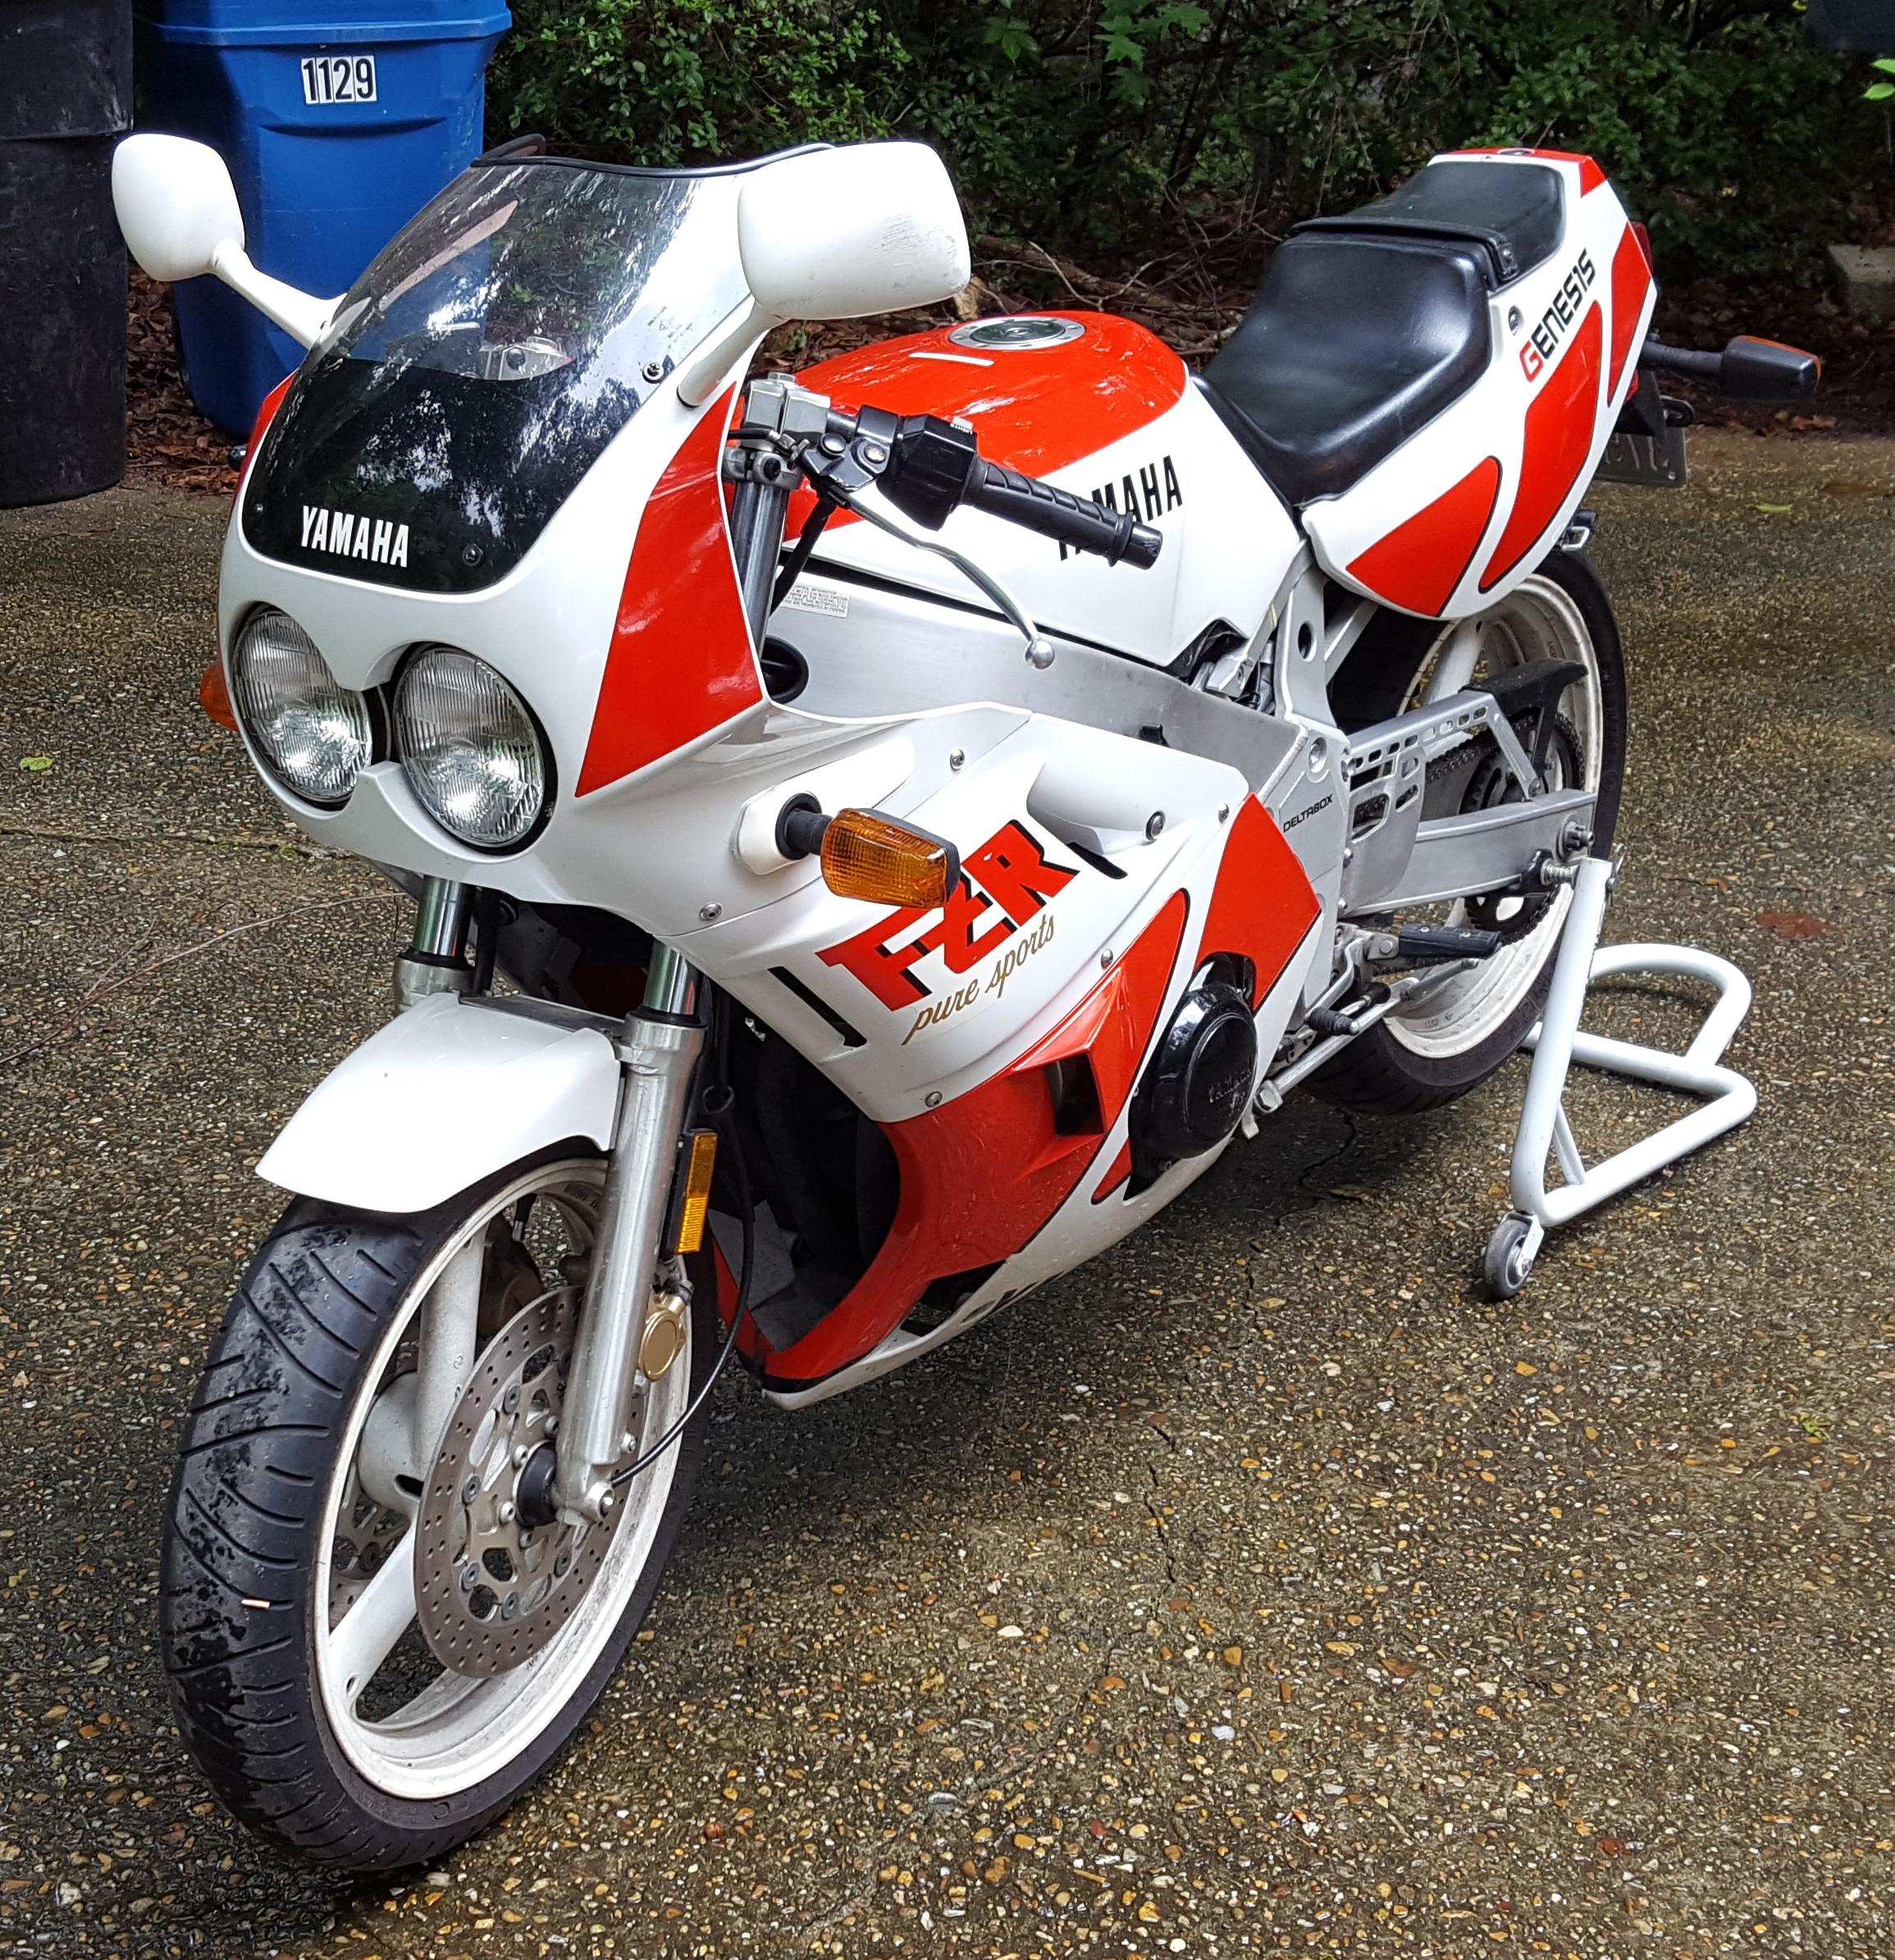 Yamaha XJ XS 250 400 600 650 750 850 1100 Virago V-Star 950 MOTORCYCLE COVER